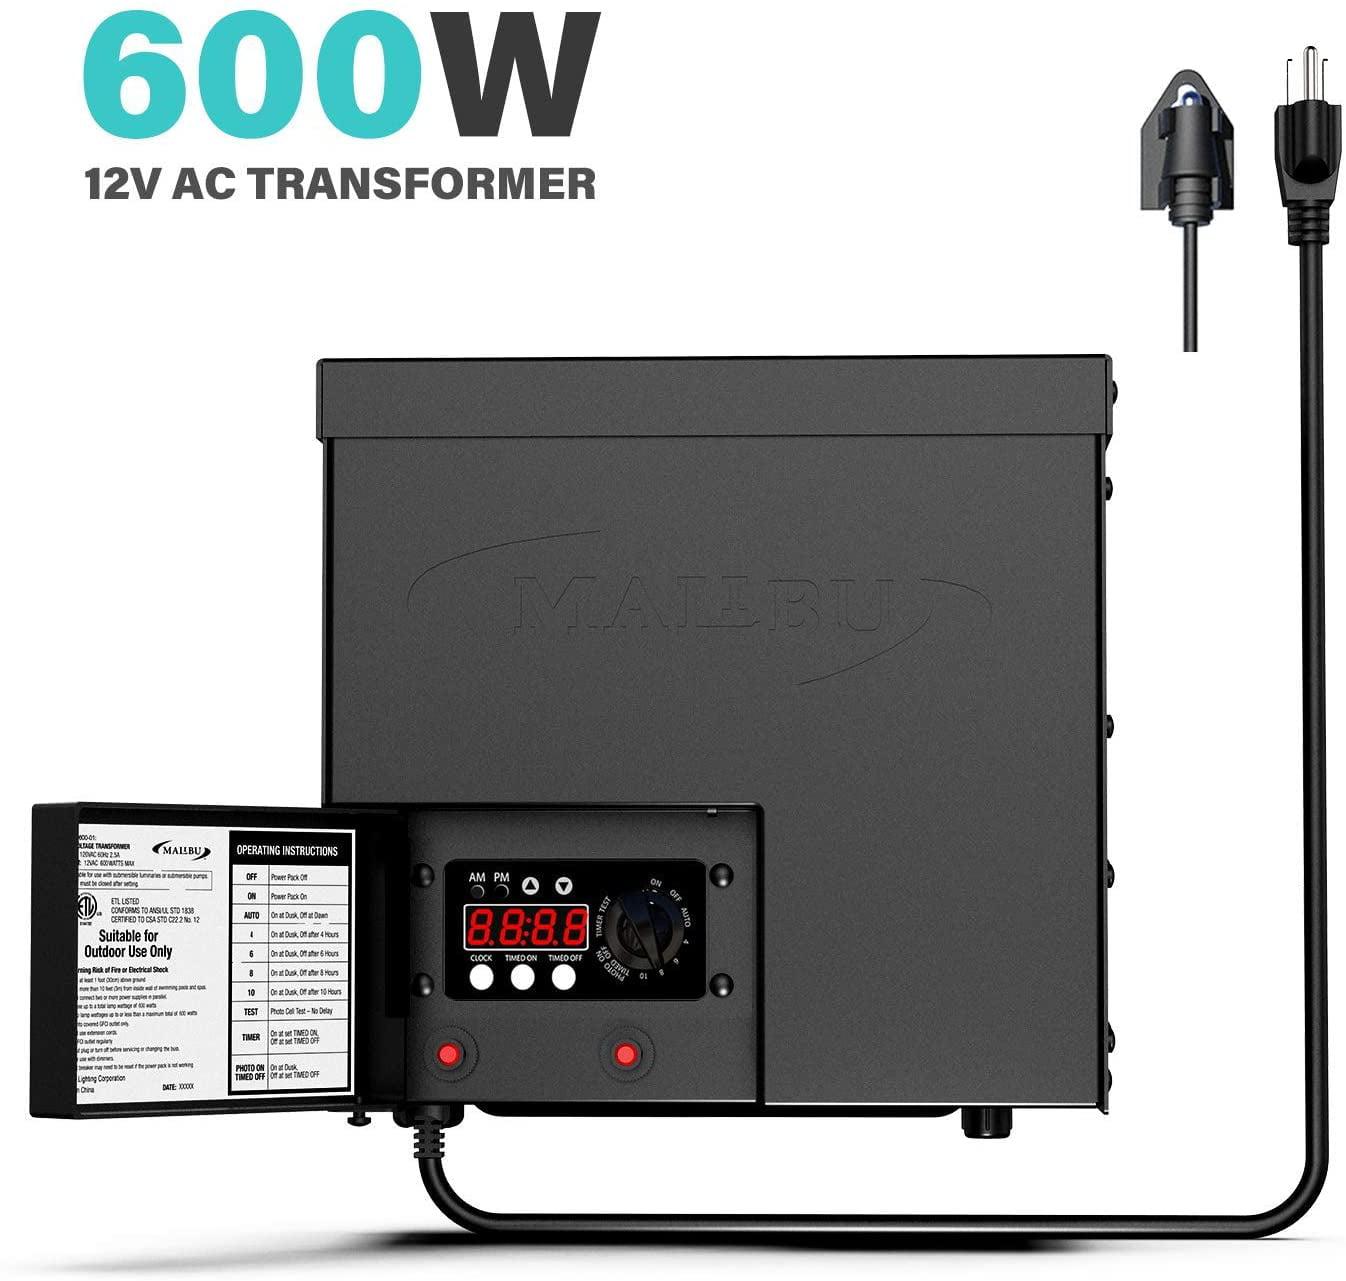 Malibu 600 Watt Transformer For Low Voltage Landscape Lighting Outdoor Garden 12v Ac Walmart Com Walmart Com